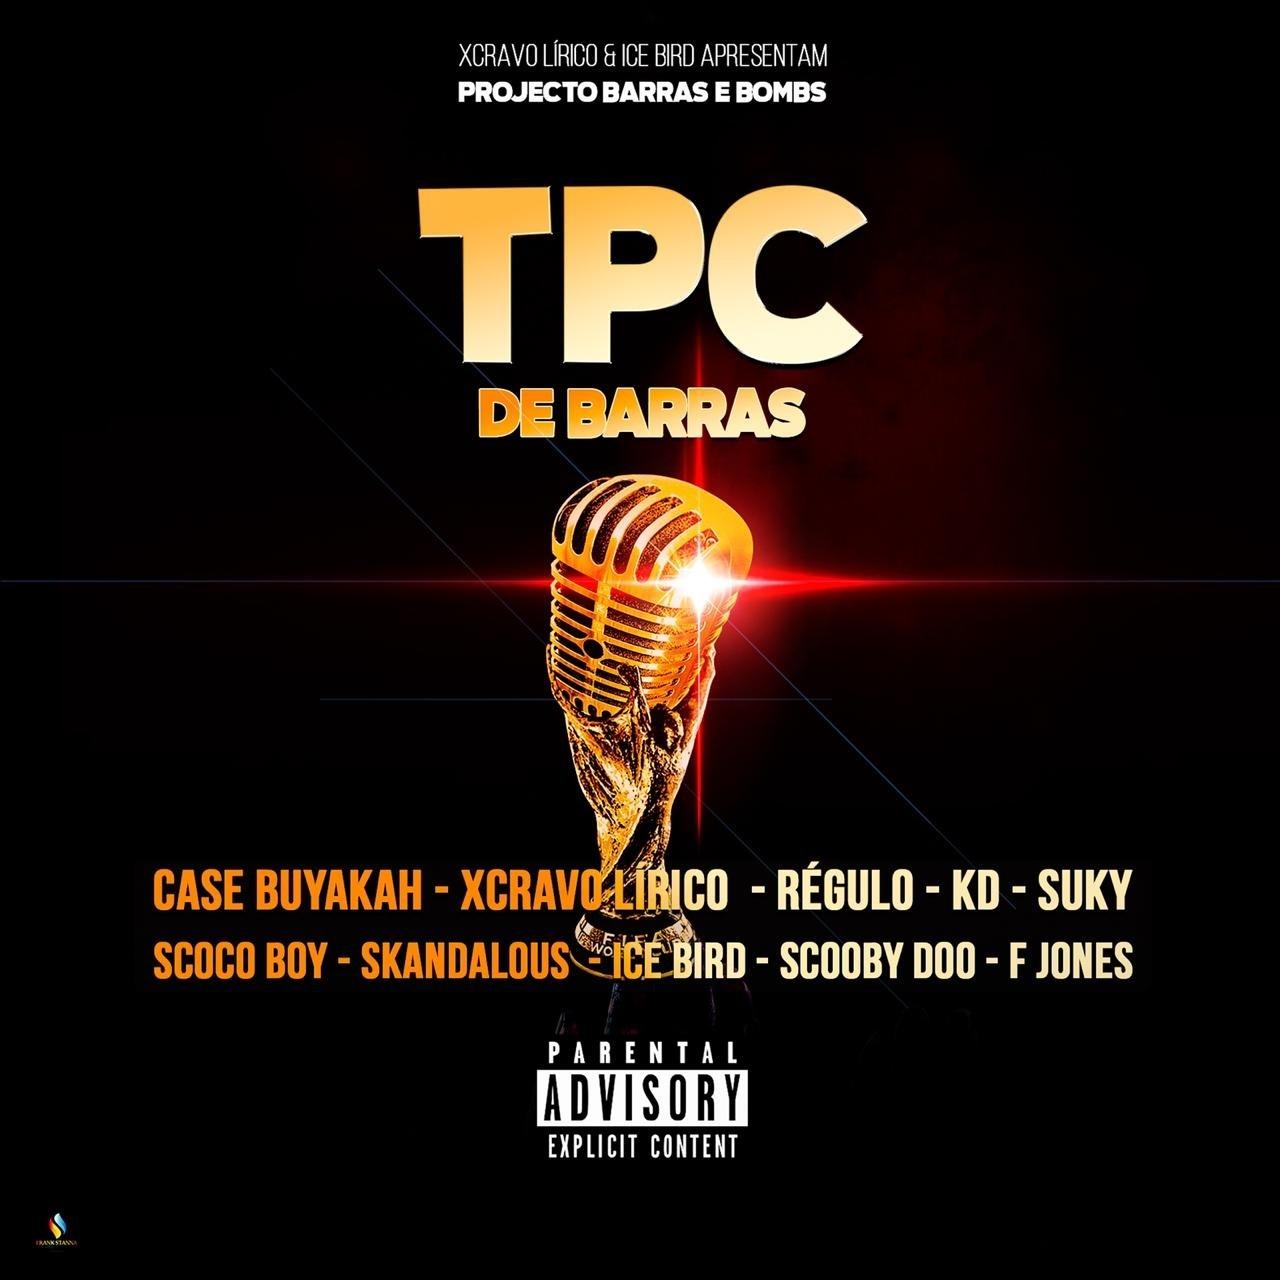 Xcravo Lirico & Ice Bird feat. Case Buyakah, Régulo, Kd, Skandalous, Suky, Scoco Boy, Scooby Doo &  Frank Jonez – Tpc De Barras